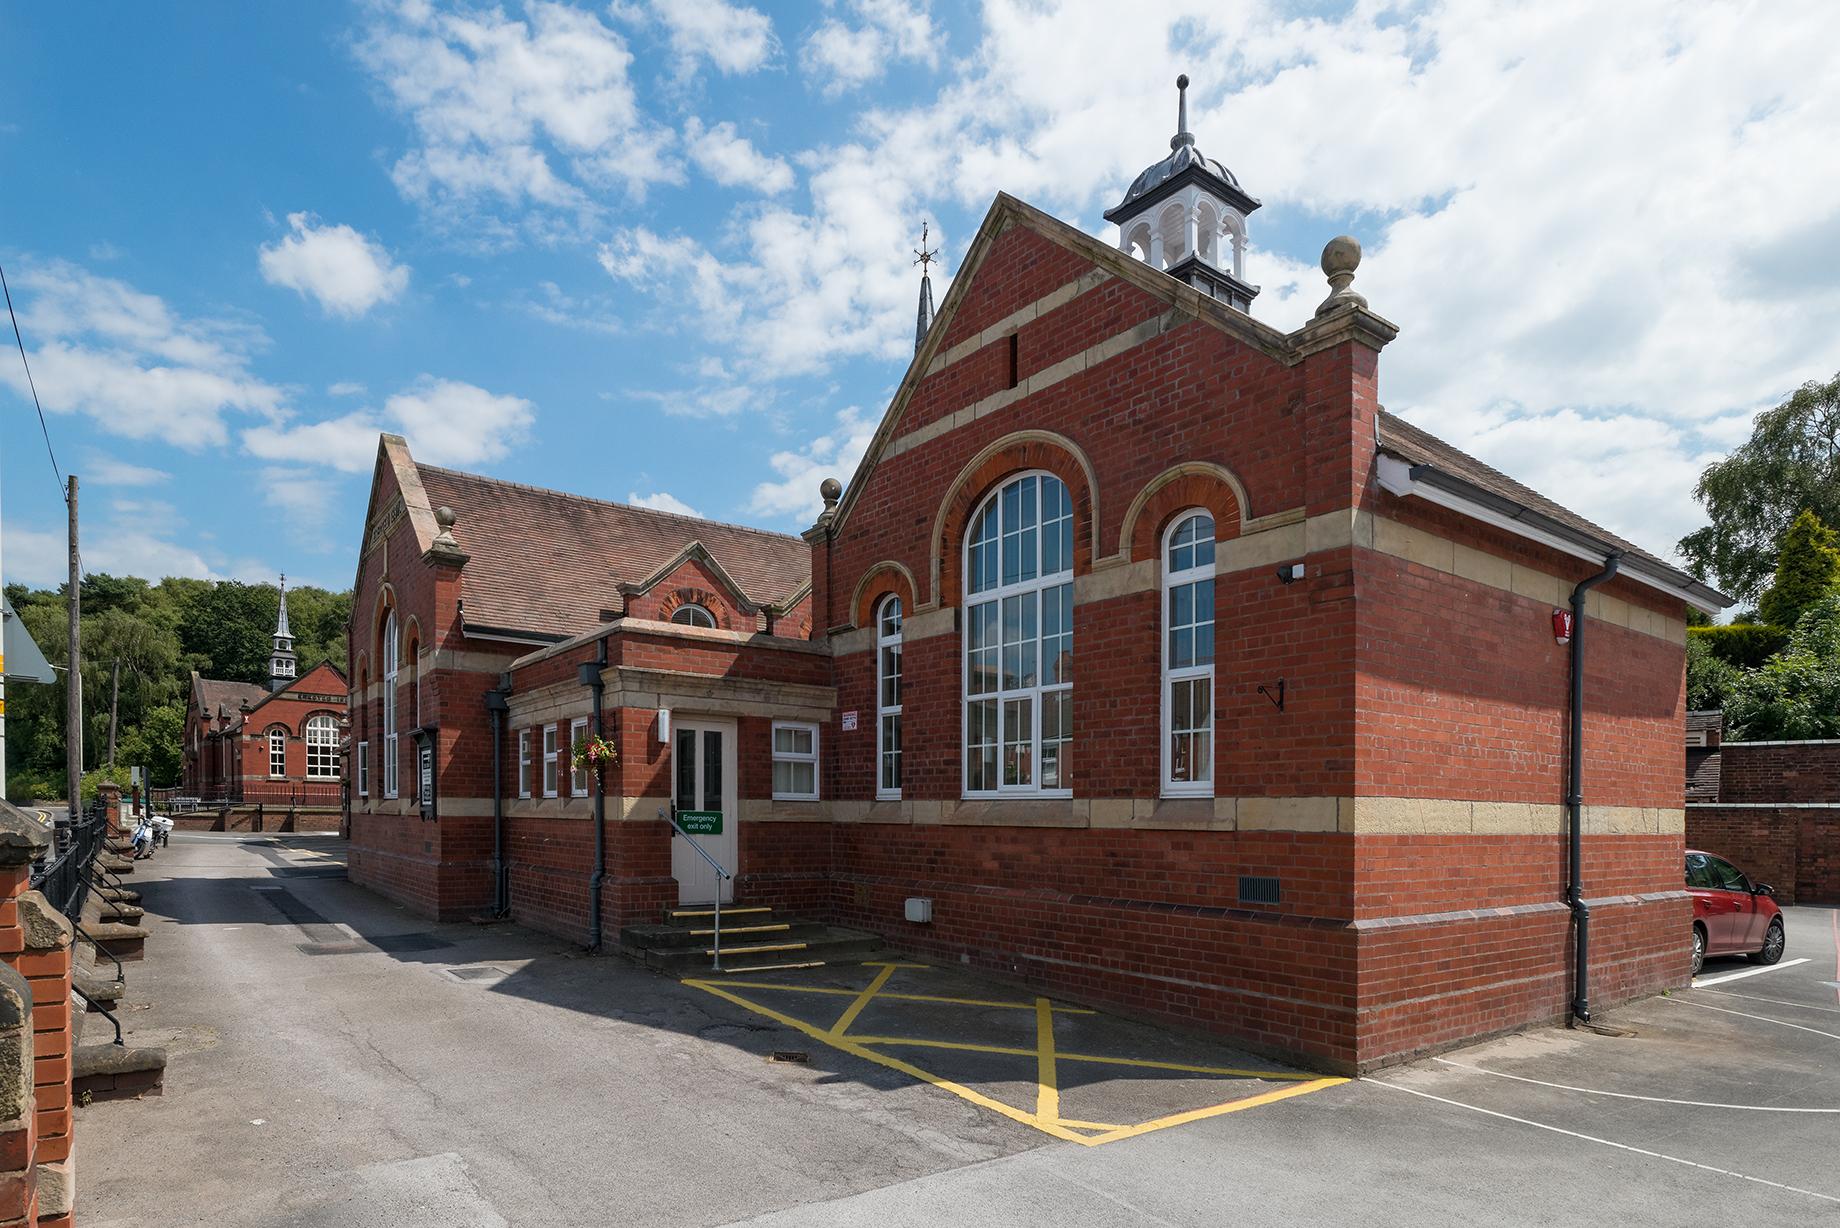 Ketley Community Centre